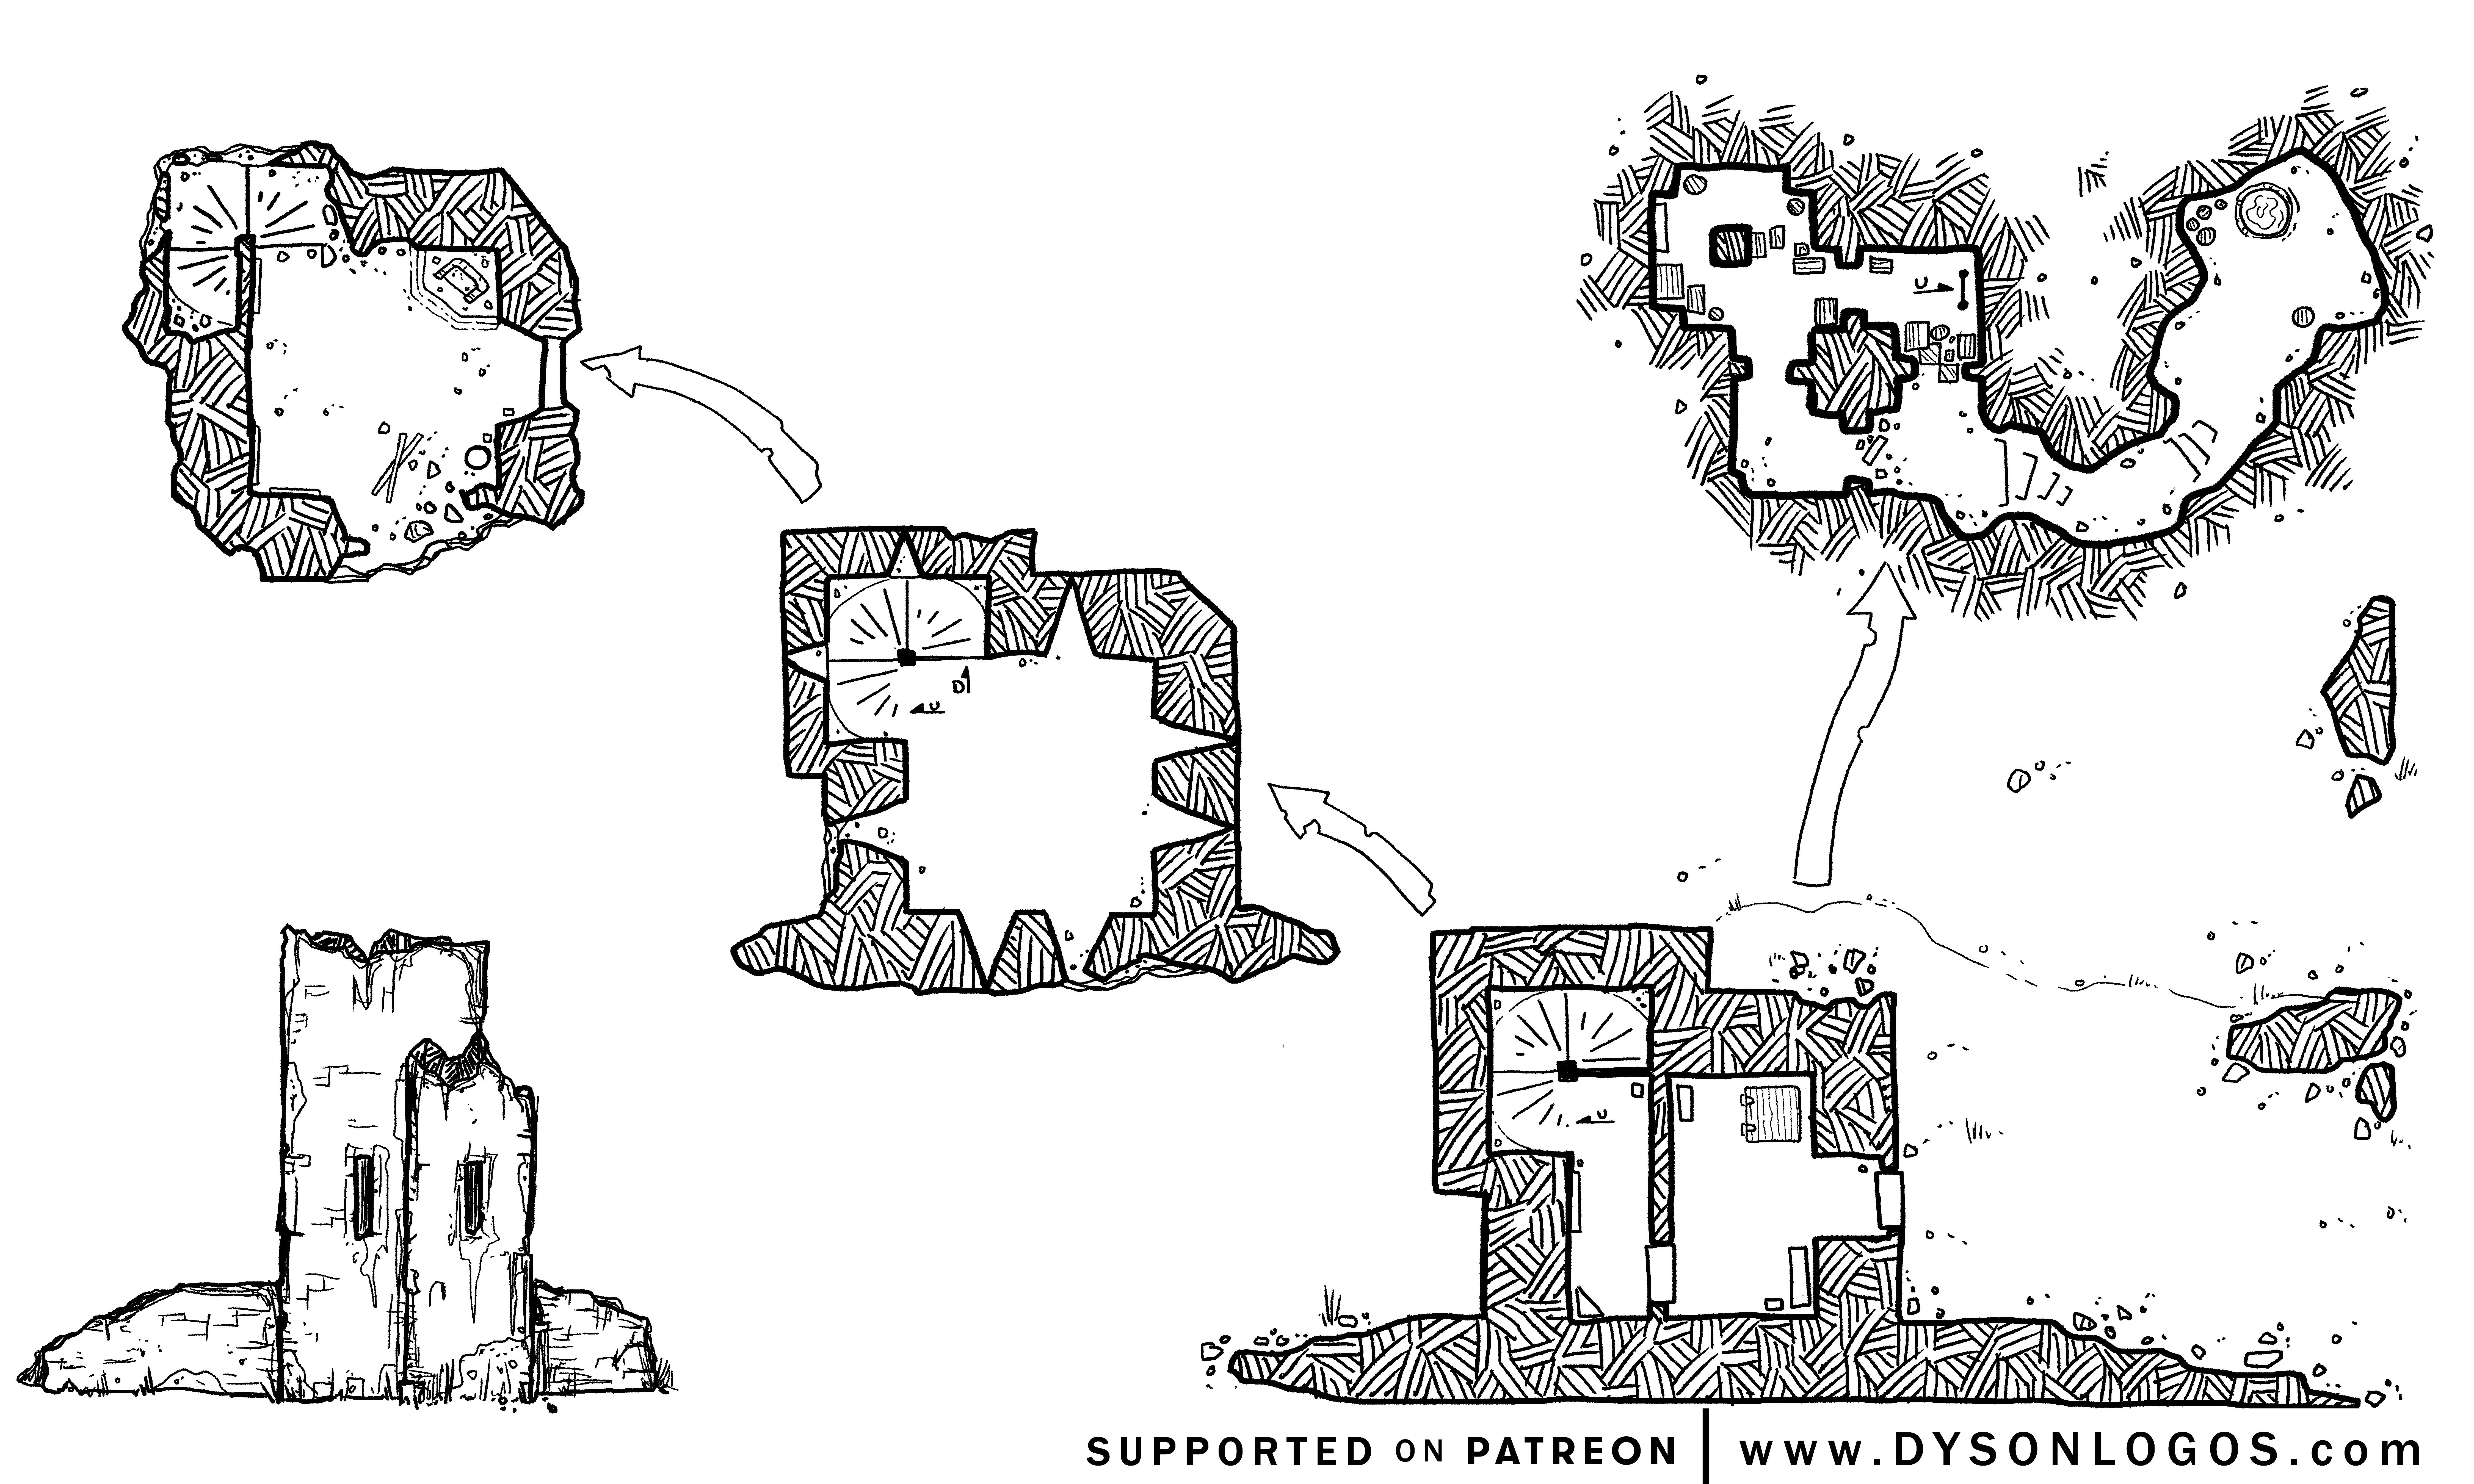 The ruins of Boar Isle Tower (1200 dpi - no grid)